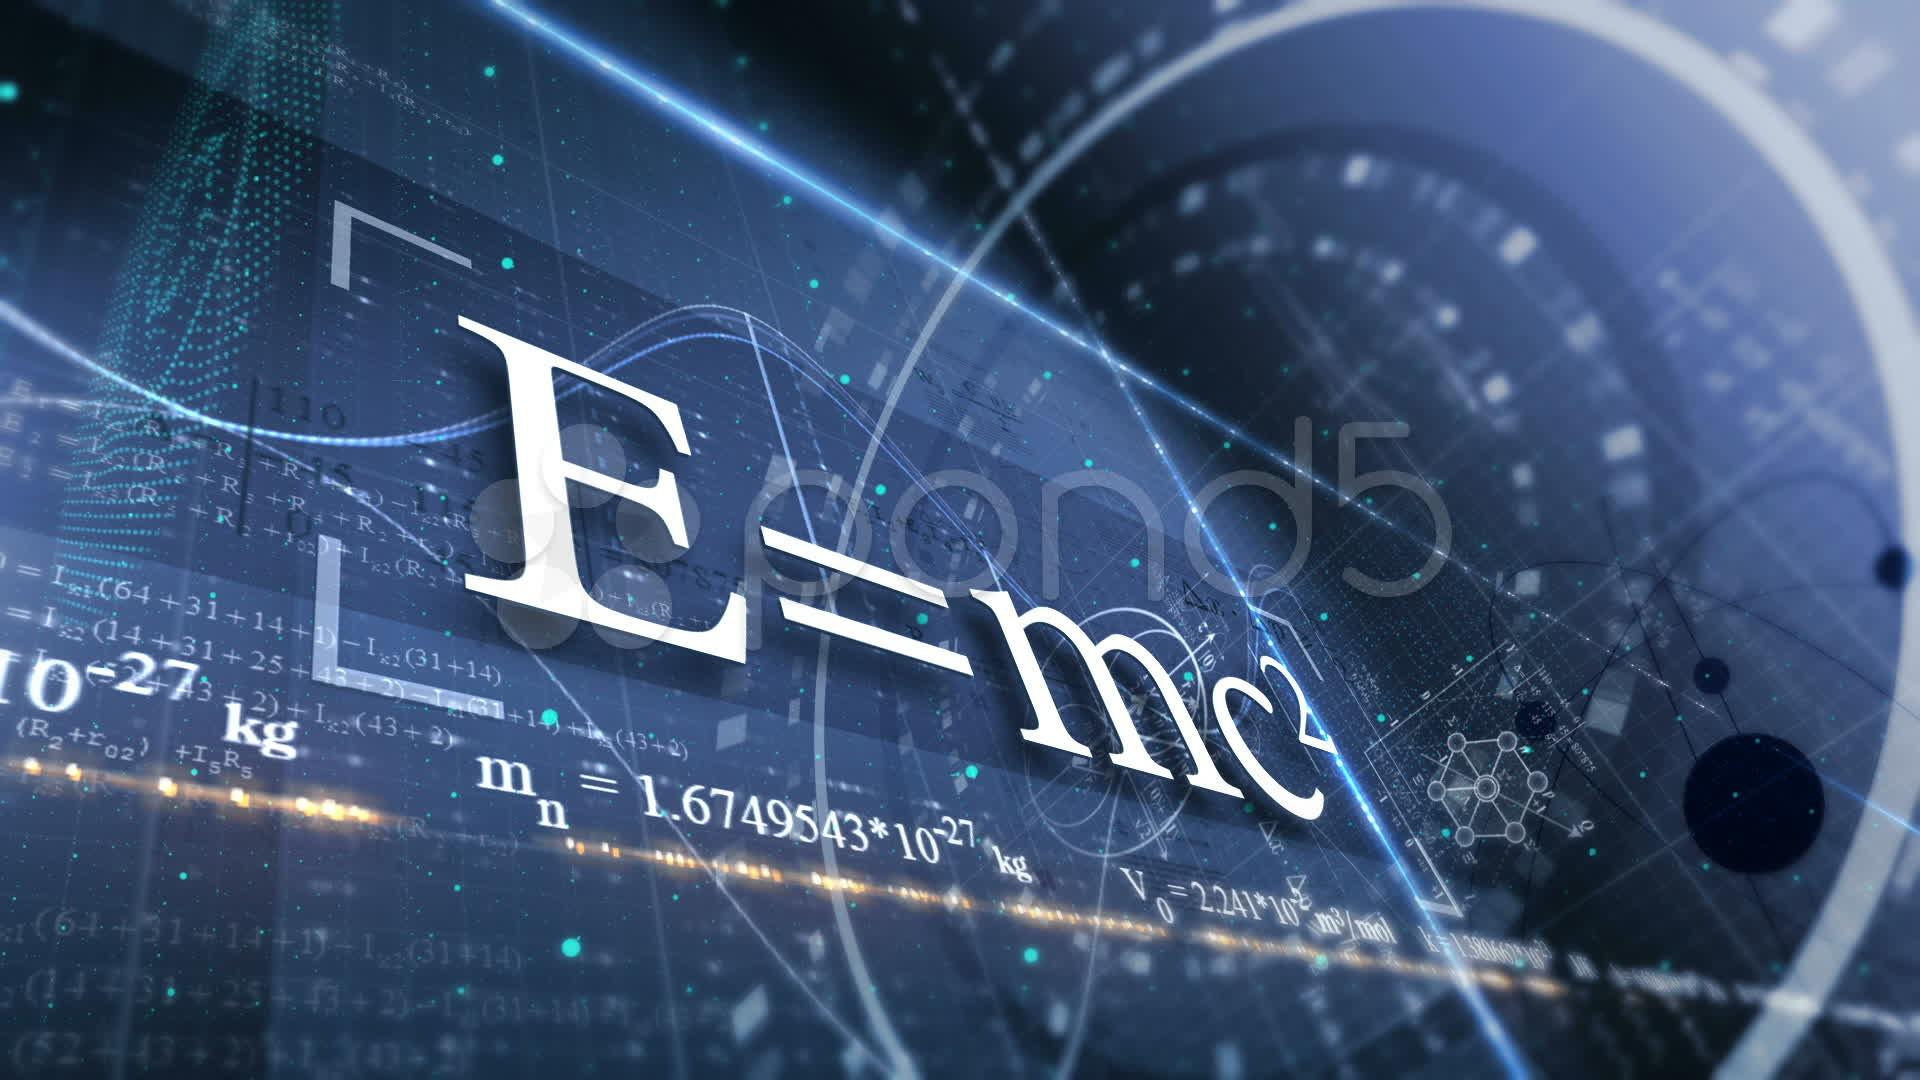 Particle Physics Wallpaper – WallpaperSafari